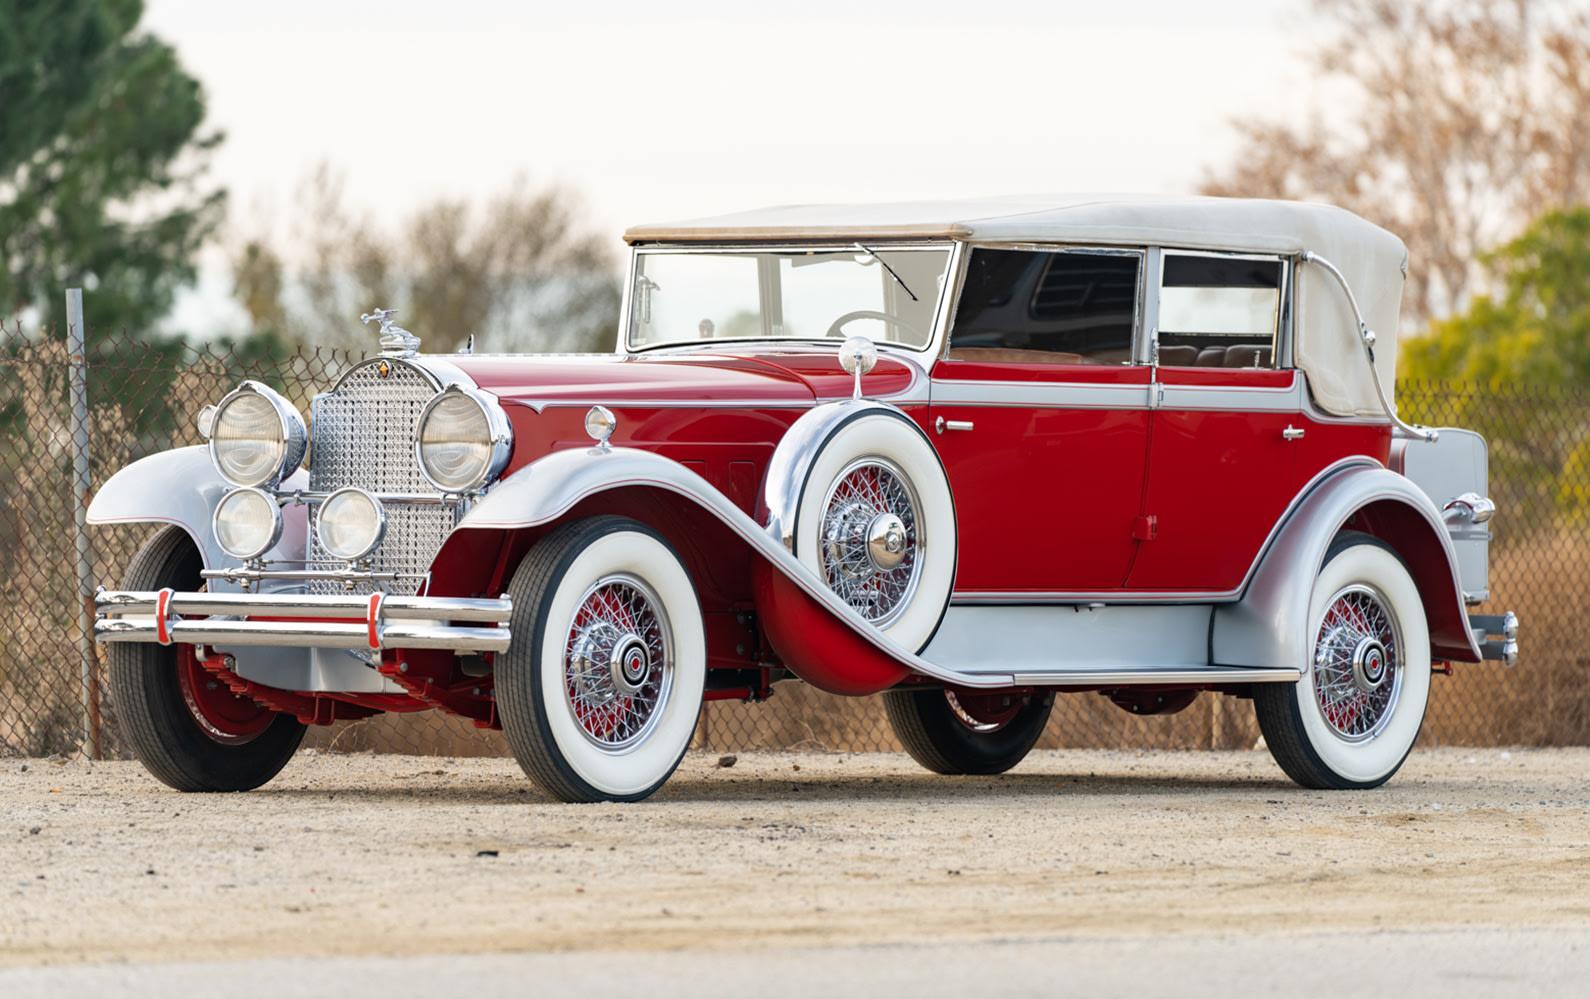 1930 Packard Deluxe Eight 745 Convertible Sedan